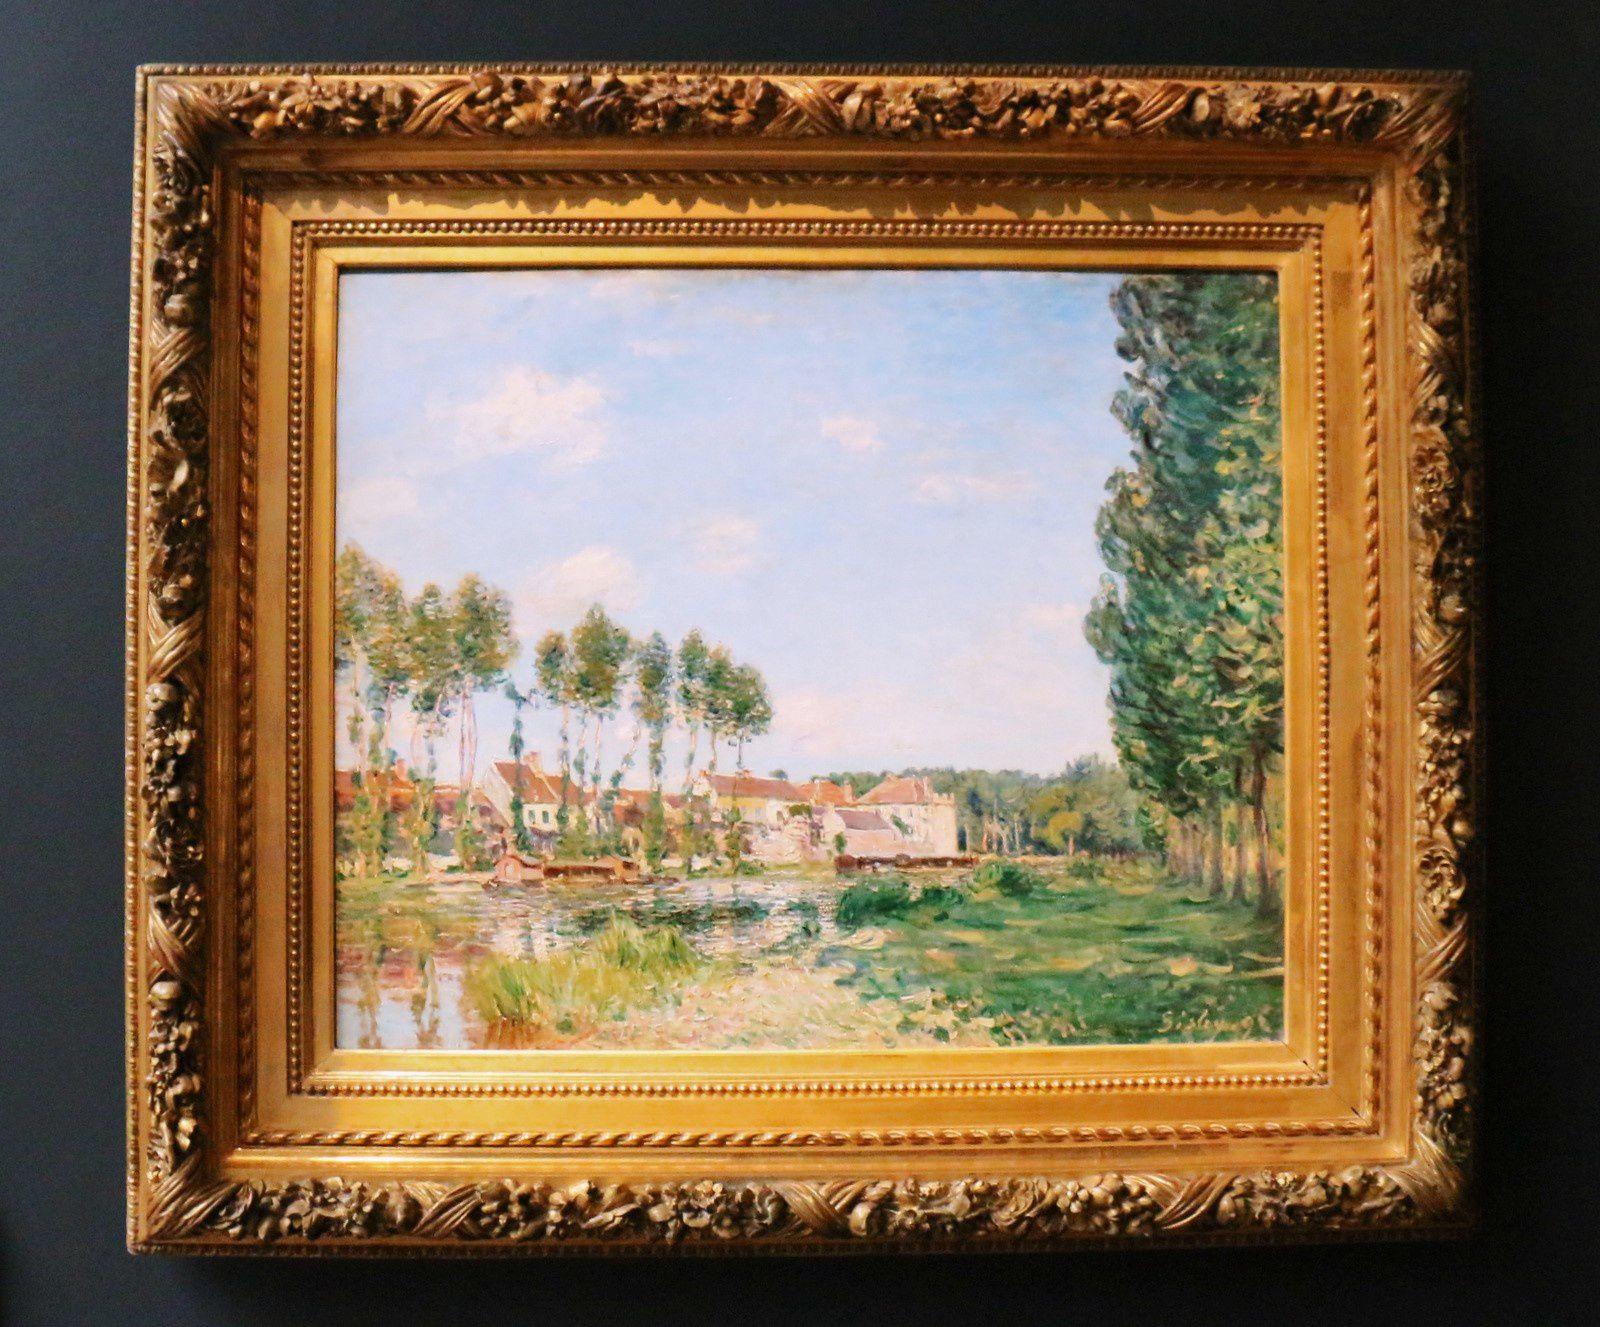 Moret, bords du Loing, huile sur toile d'Alfred Sisley